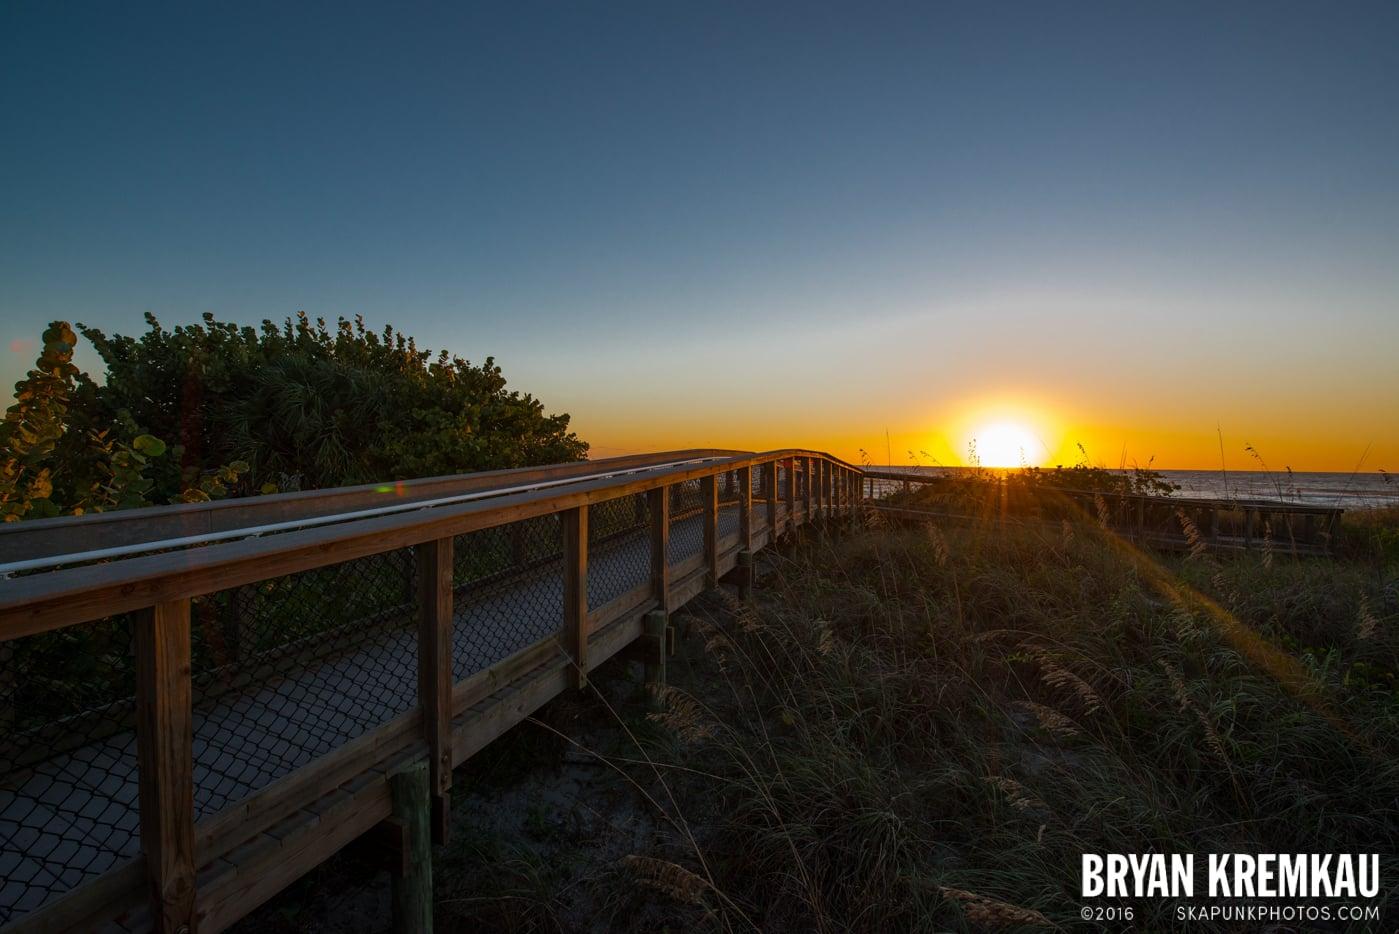 Sunsets, Astrophotography & Birds @ Venice, Florida - 10.25.14 - 11.5.14 (102)